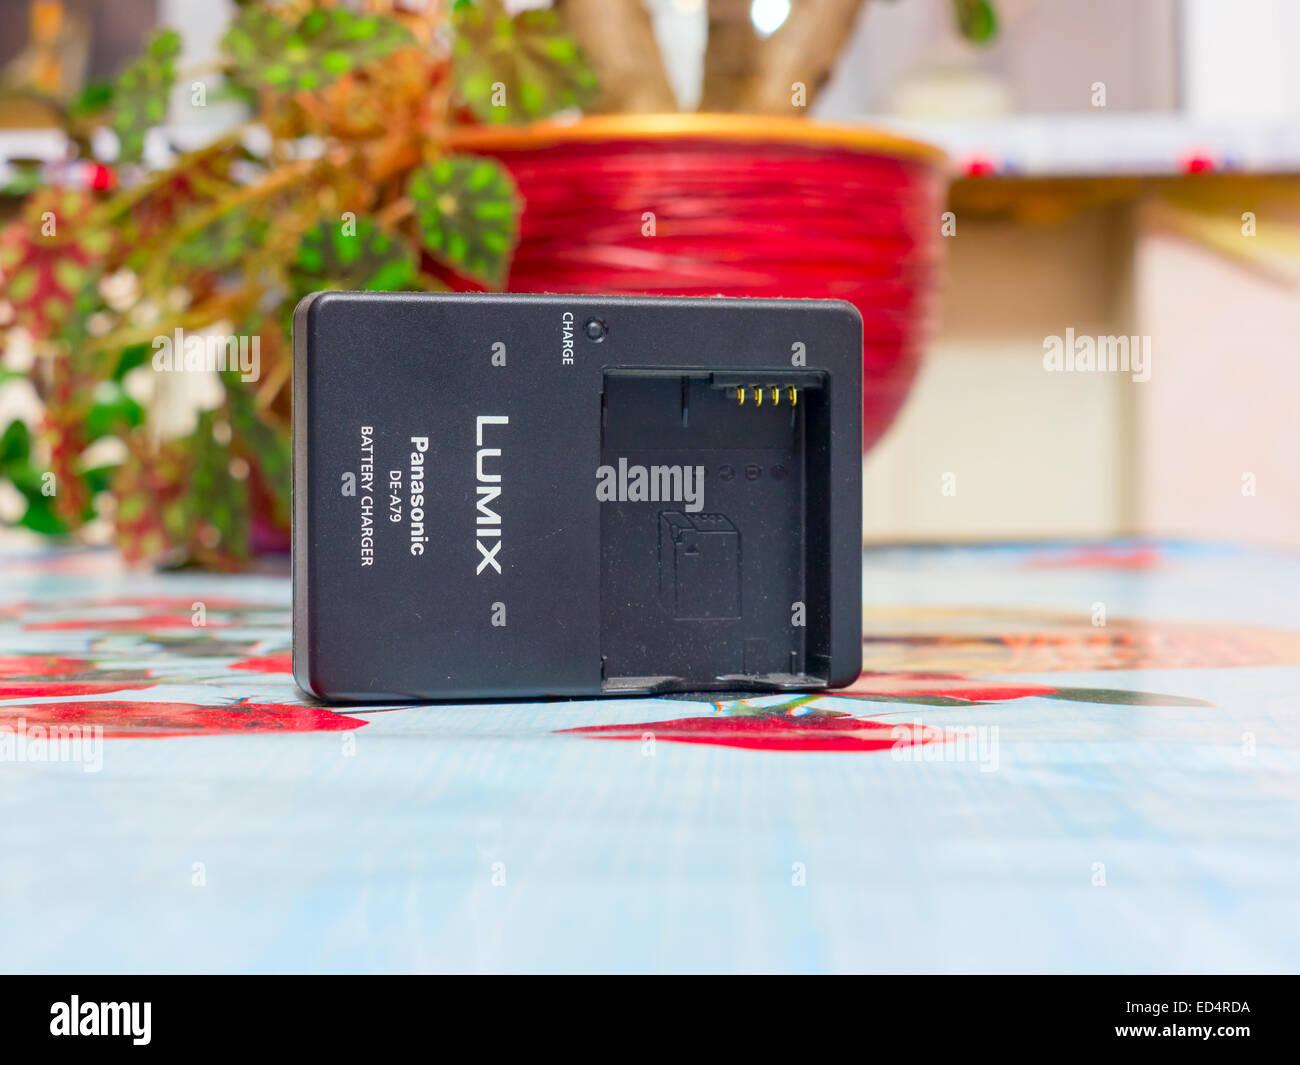 GOMEL, BELARUS - NOVEMBER 24, 2014: Battery Charger Panasonic Lumix DE-A79. - Stock Image